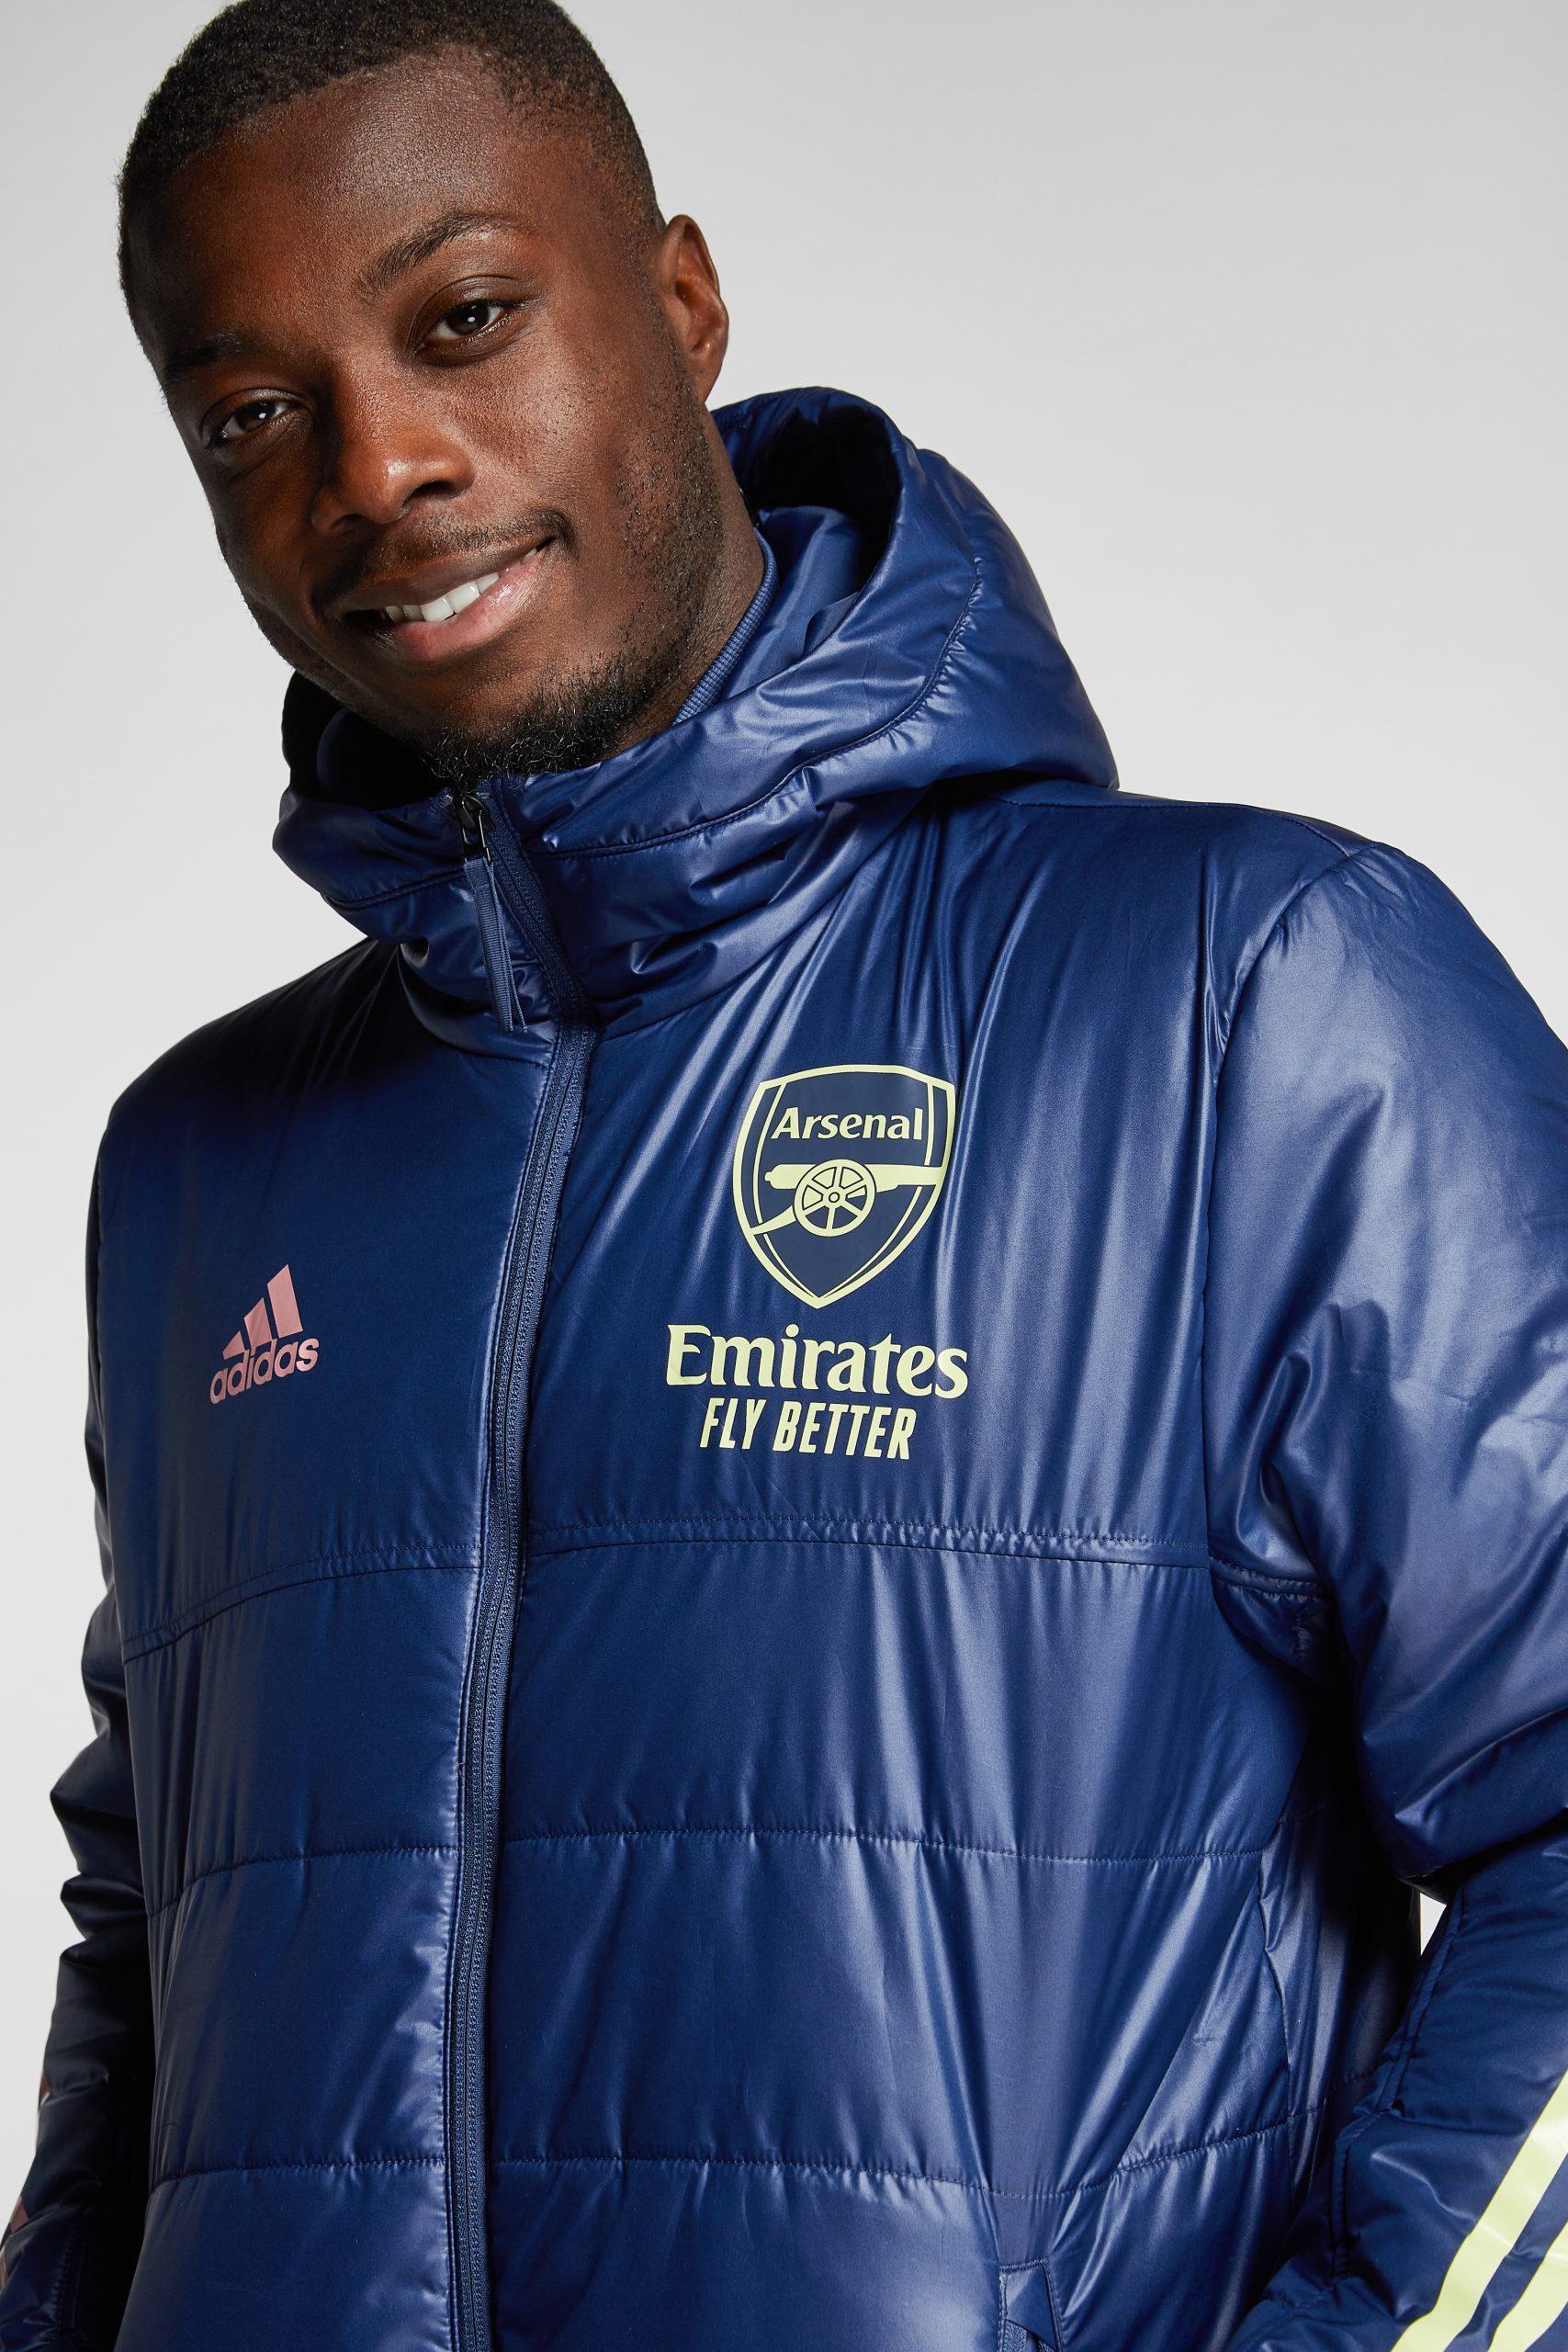 Arsenal Adidas Training Range 20/21 Video Production Birmingham